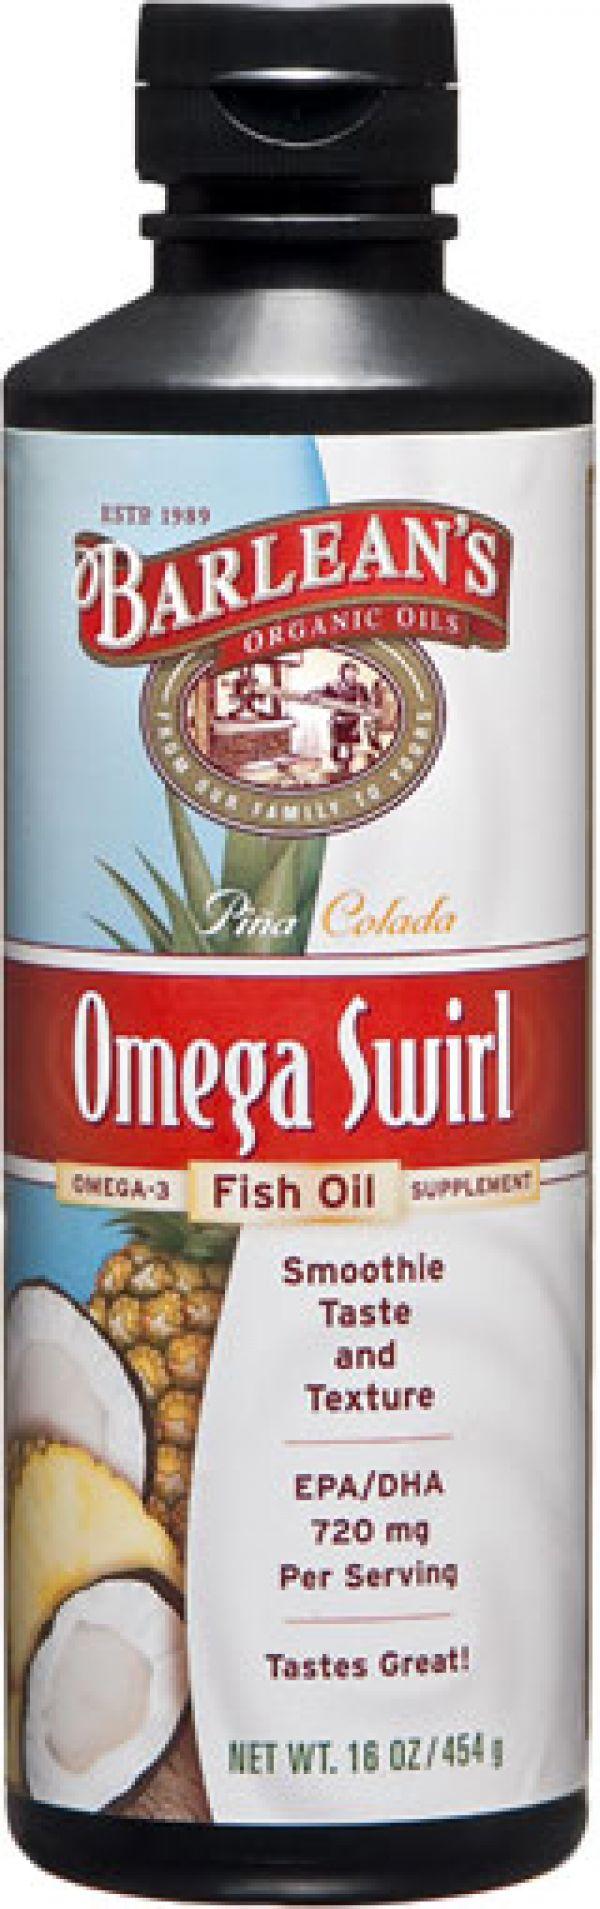 Barlean 39 s omega swirl fish oil supplement pina colada 16 fl oz for Barlean s omega swirl fish oil